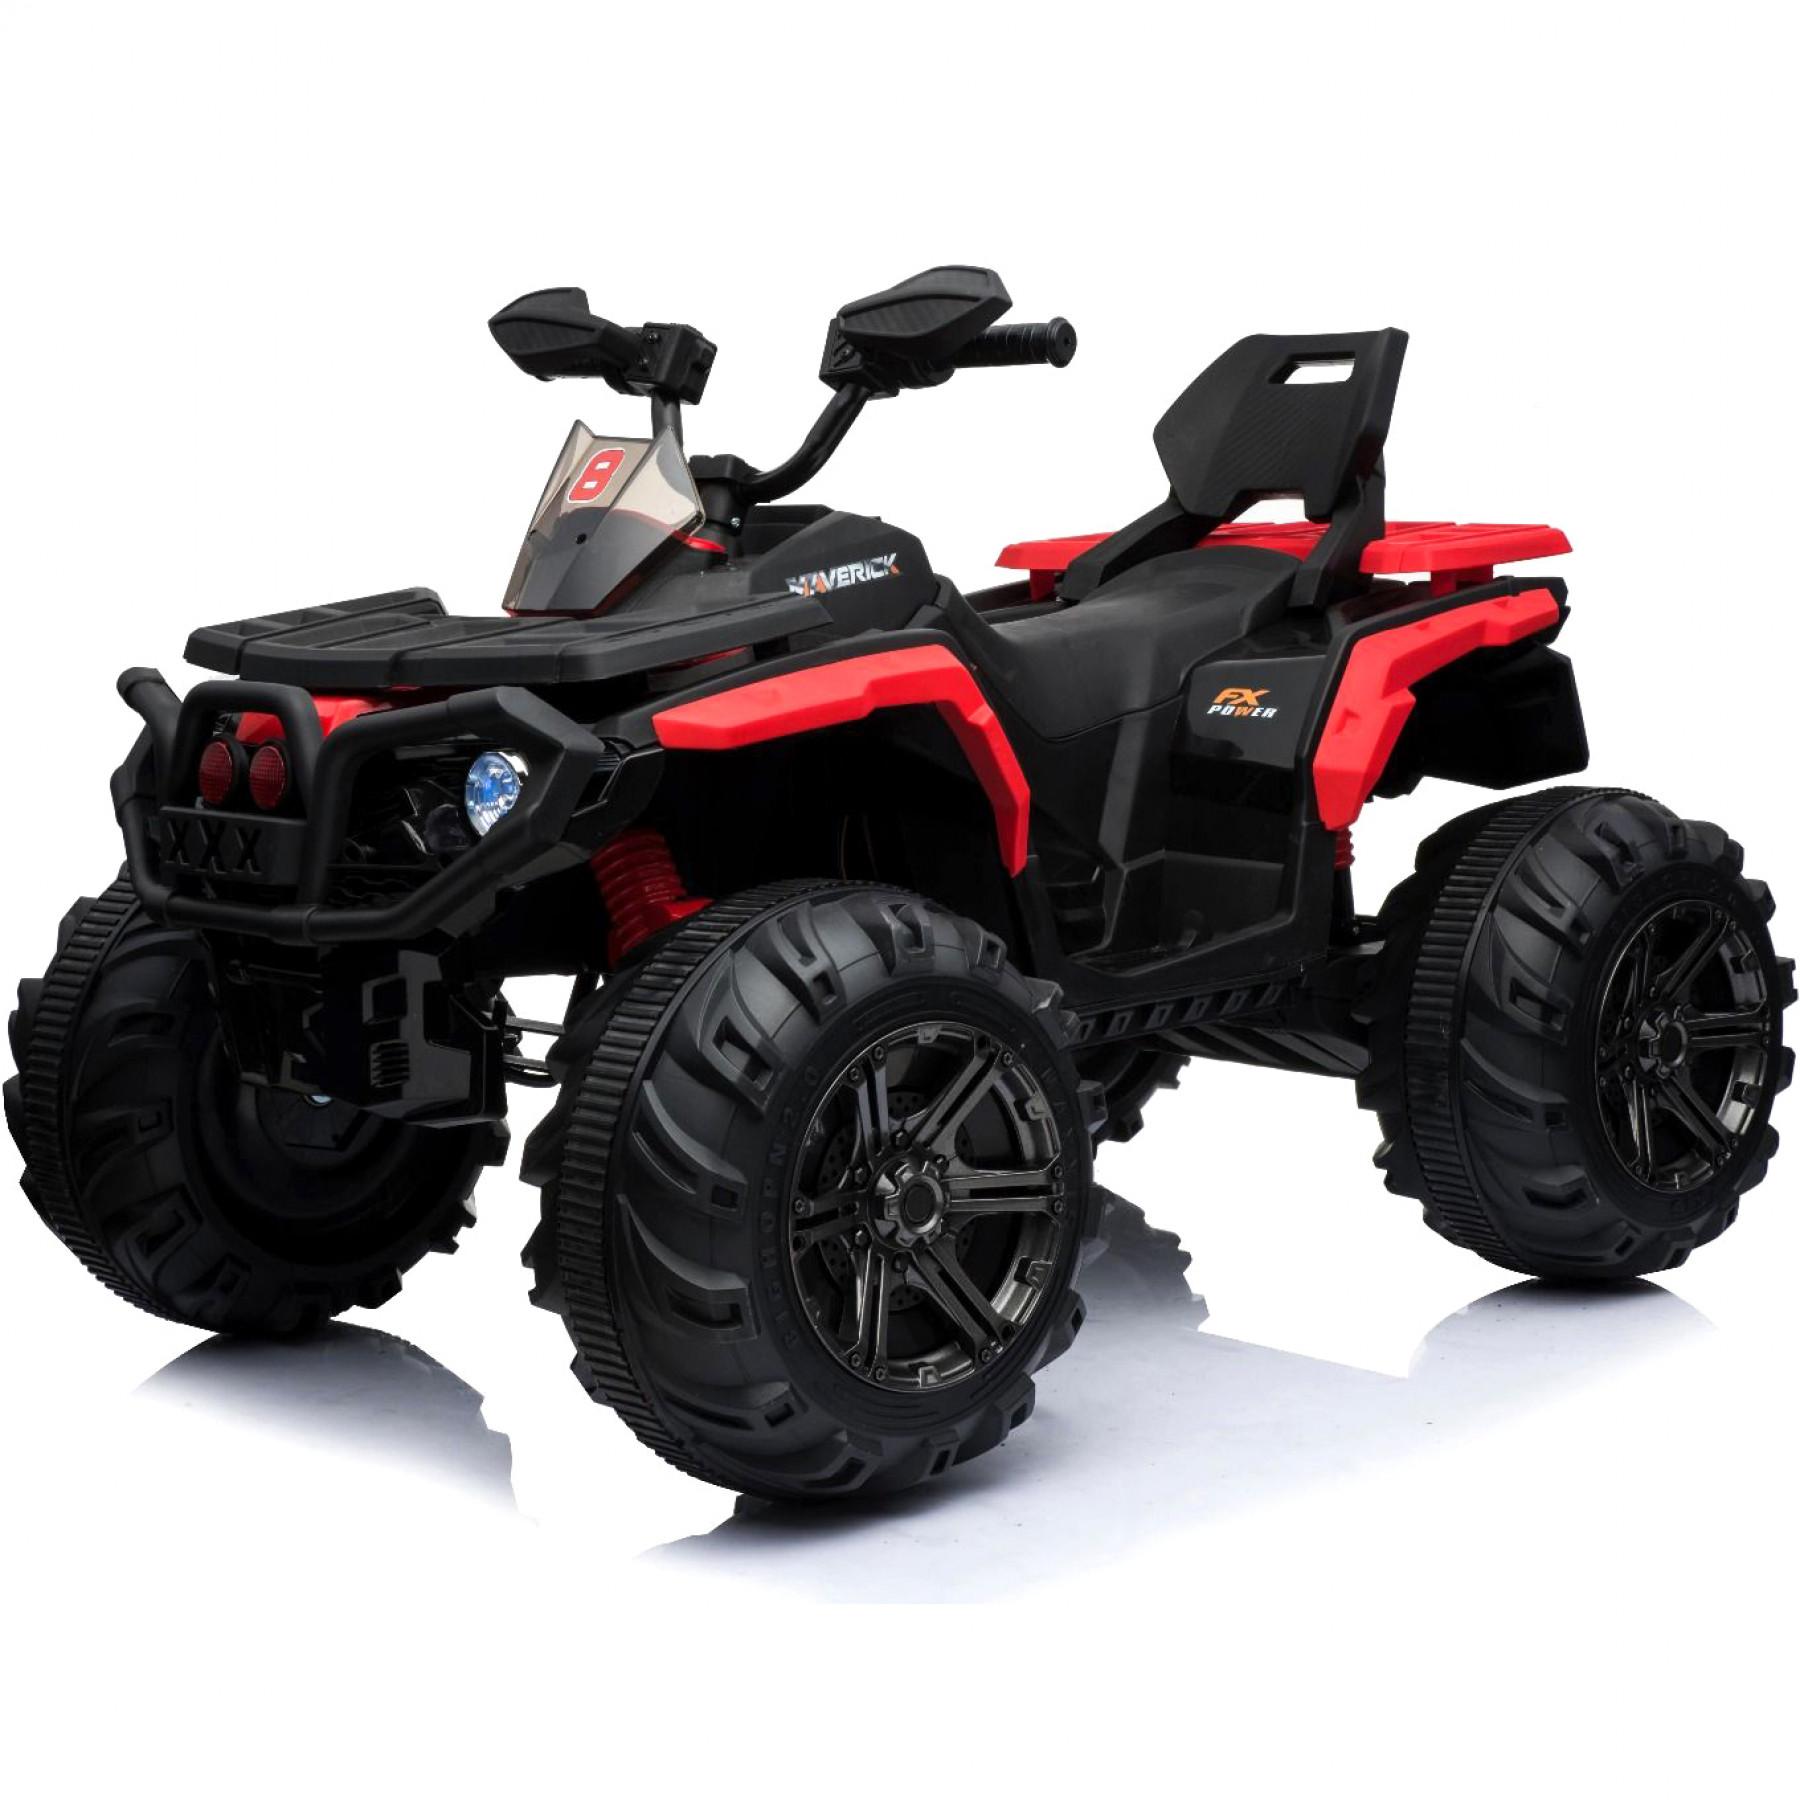 Xtreme 12V Children's Ride on Electric Quad ATV Red